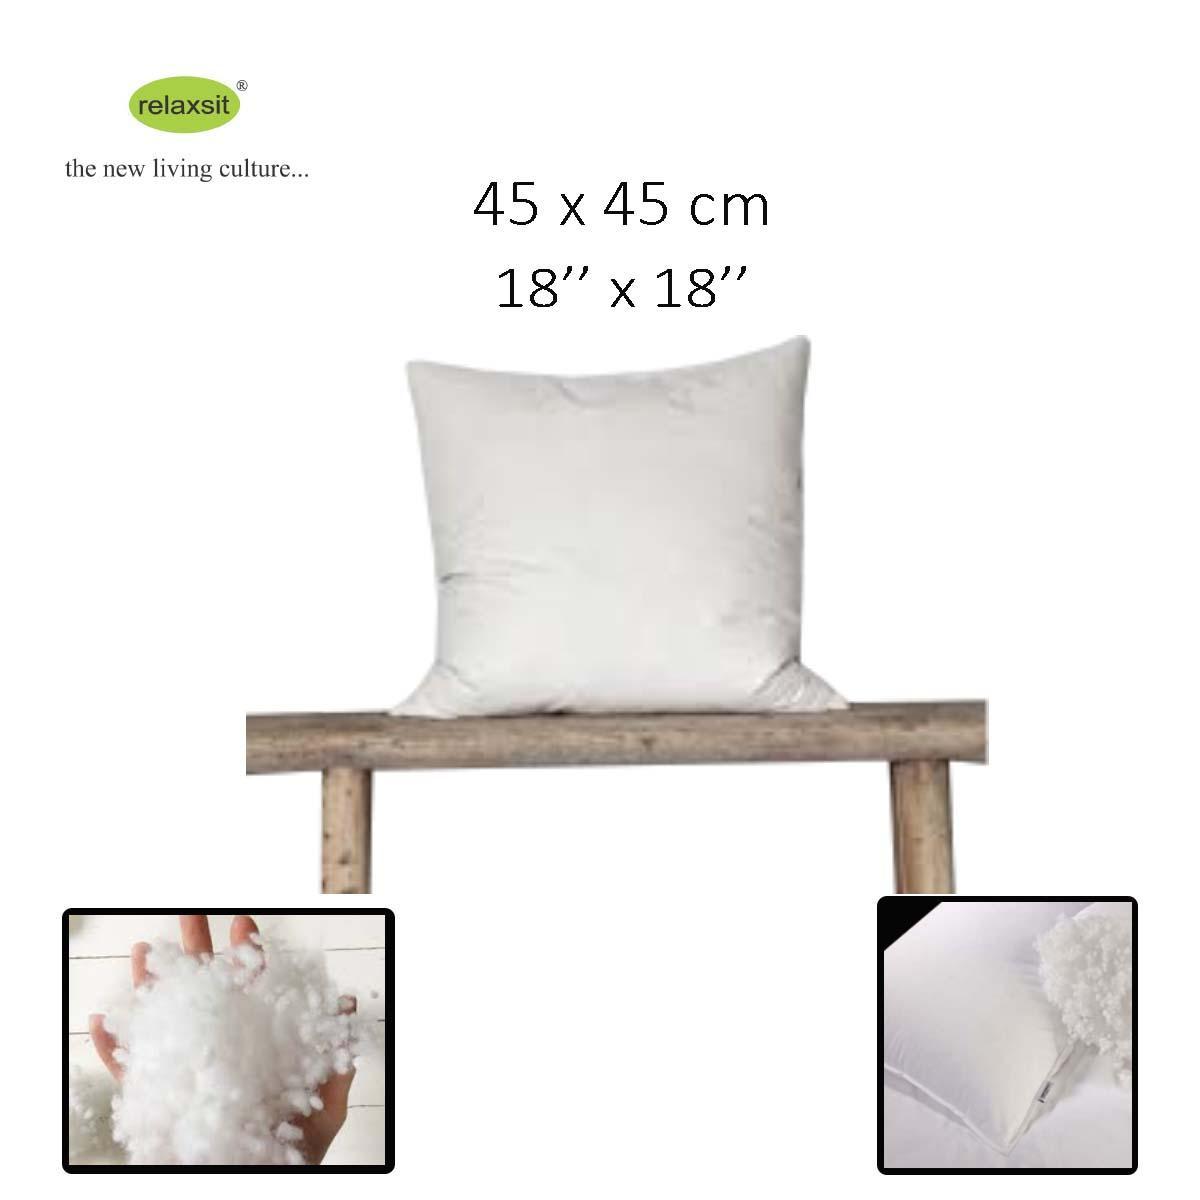 Cushion Filling case 18  X 18  or 45 x 45cm  Square Poly Pillow Insert Pillow Inner Square Throw Pillow Case Decorative sofa Cushion Cover